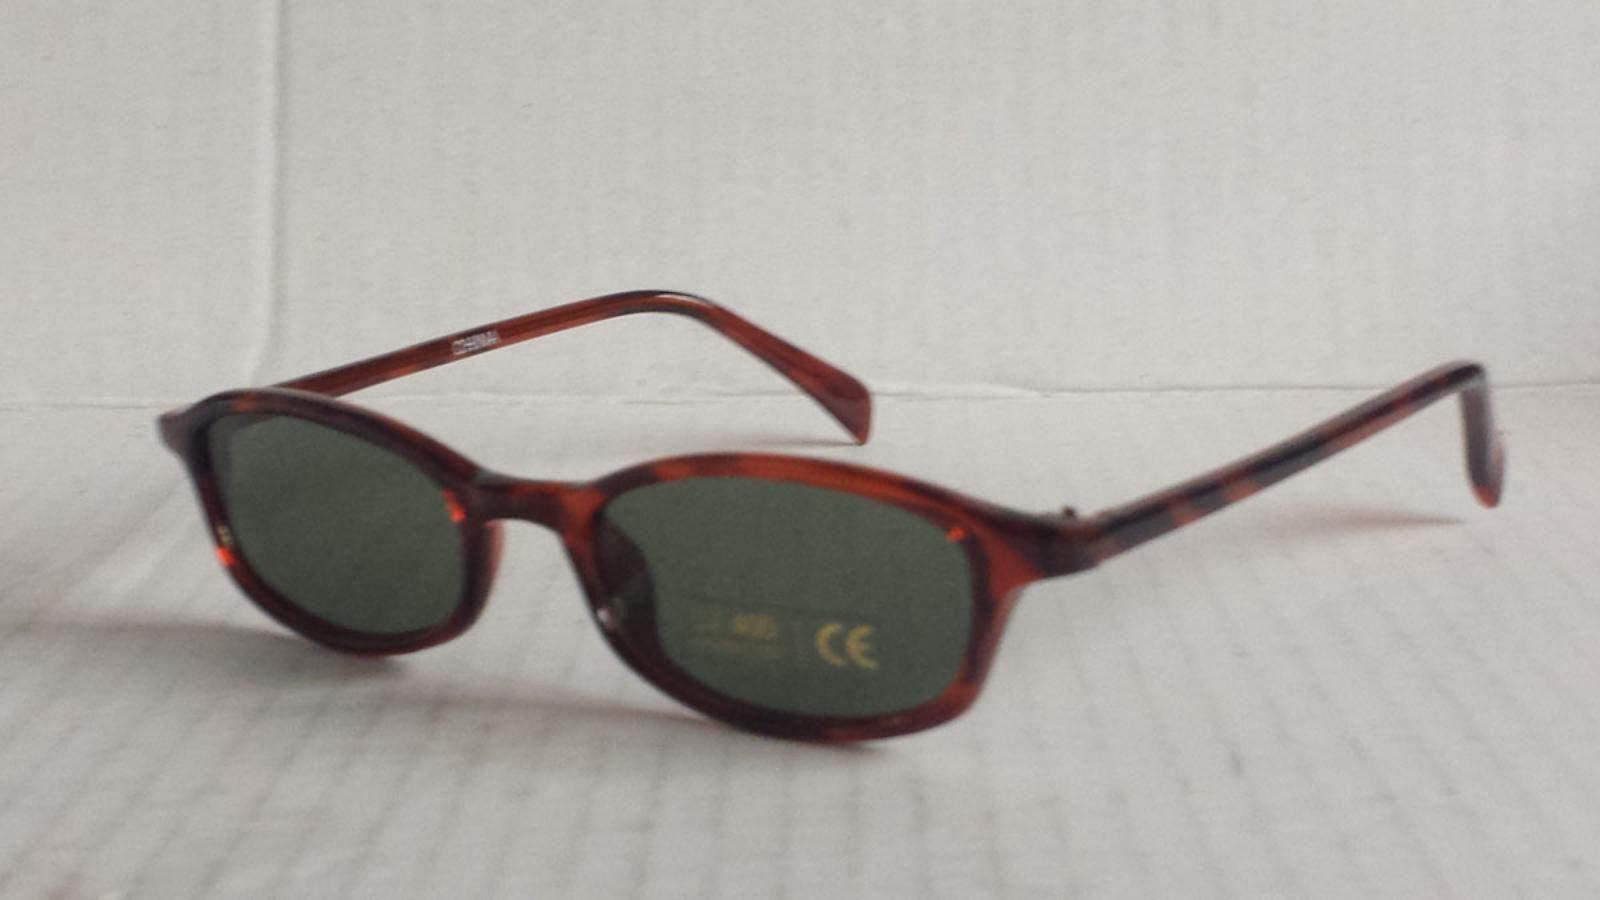 #women brown frame black lens sunglasses (6059) New visit our ebay store at  http://stores.ebay.com/esquirestore